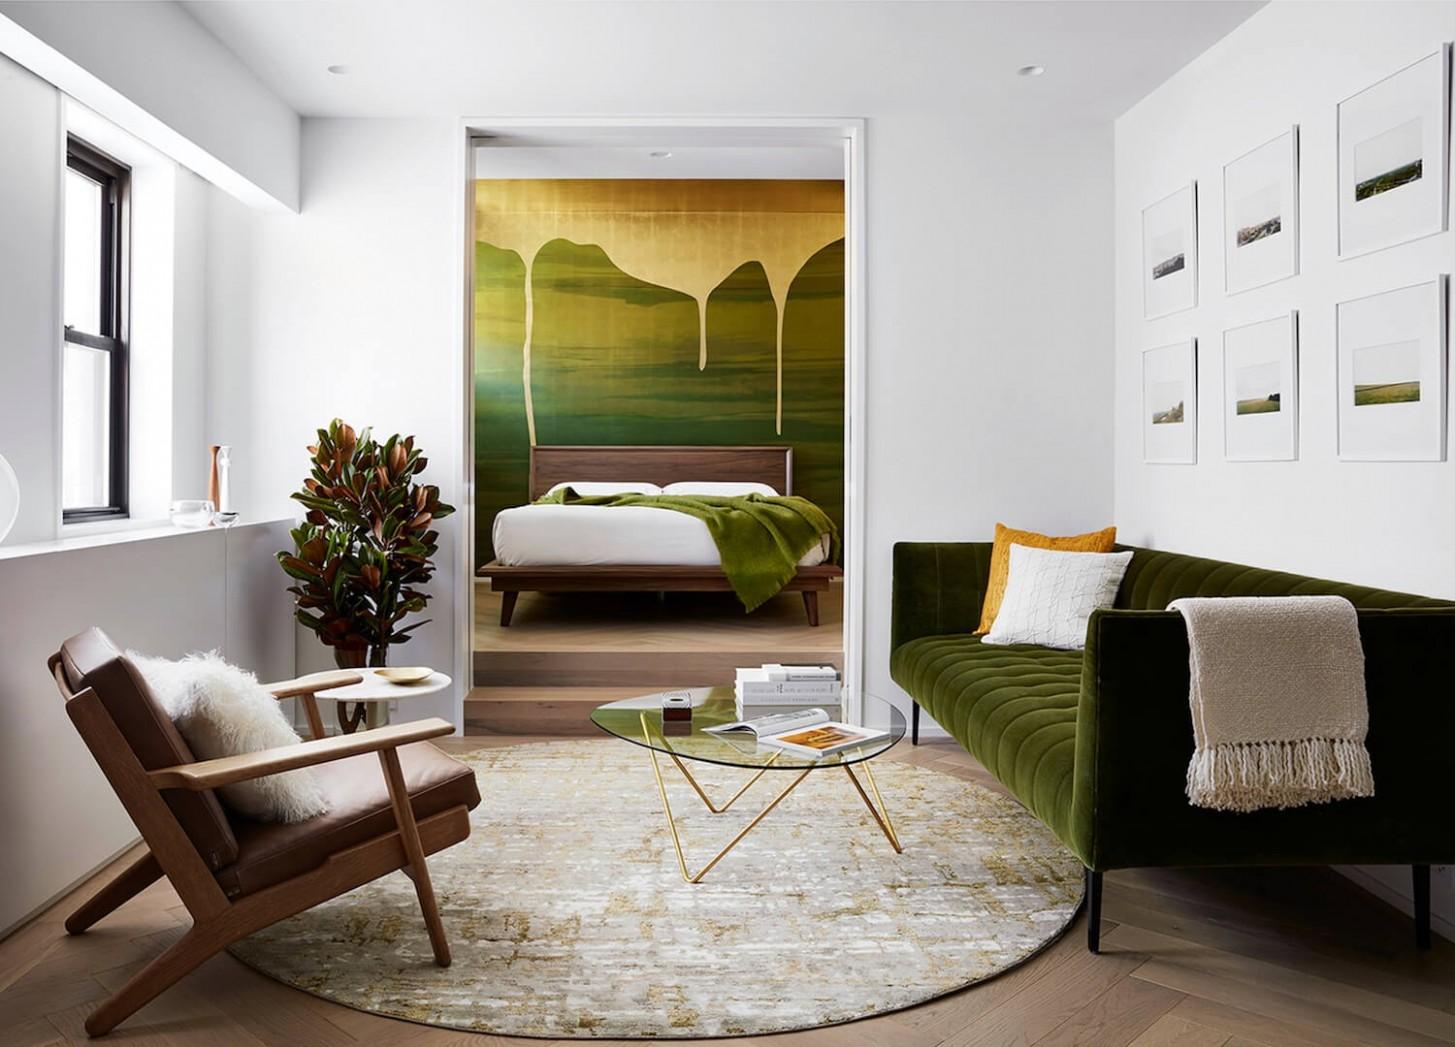 Interior Design Project Brings Nature Inside This New York Apartment - Apartment Design New York